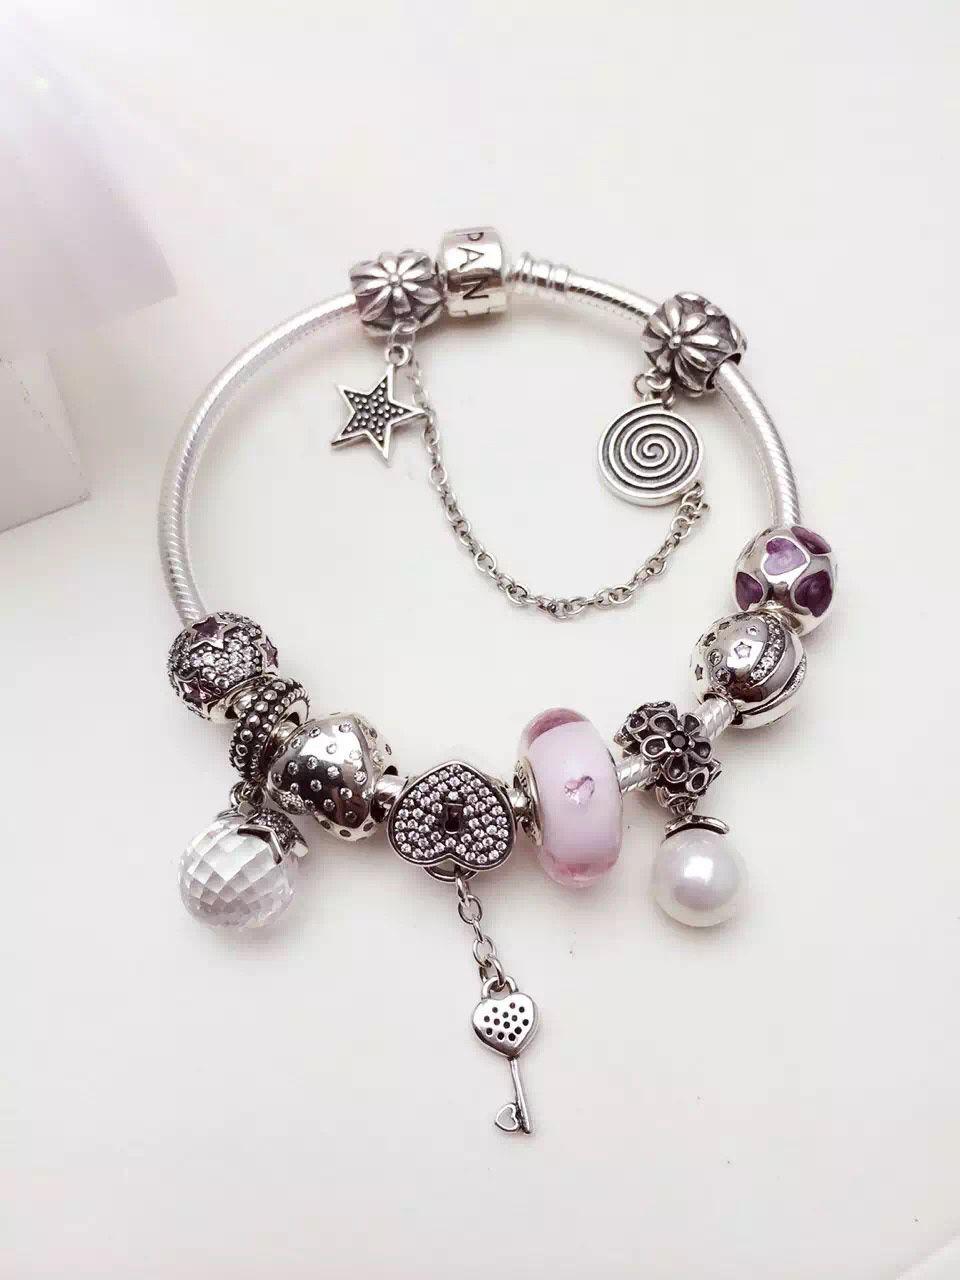 33ae5eb84 $239 Pandora Charm Bracelet White Pink. Hot Sale!!! SKU: CB01700 - PANDORA  Bracelet Ideas